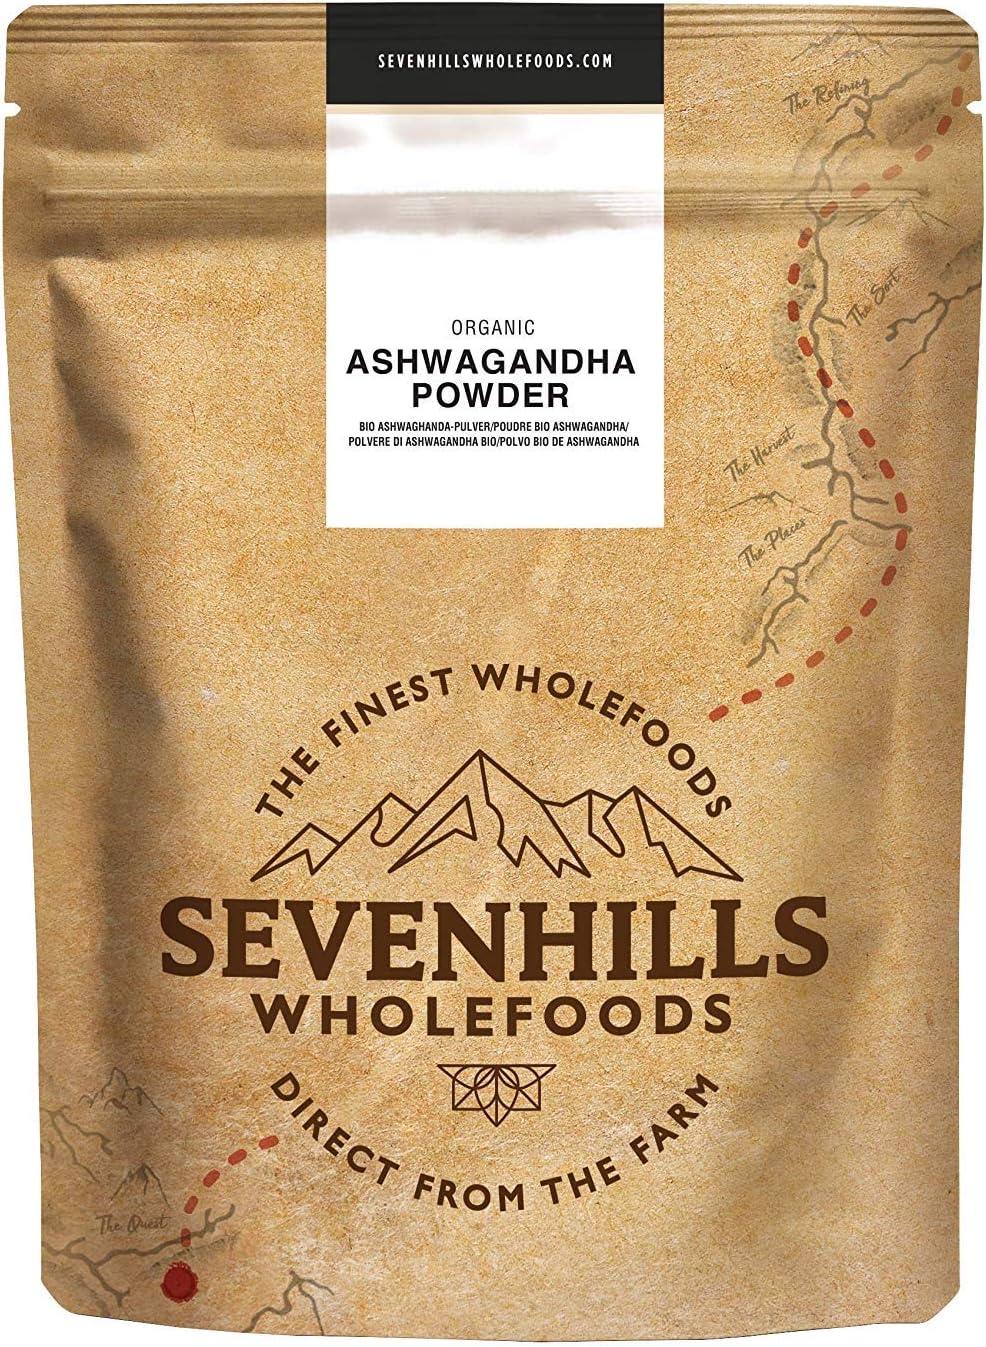 Sevenhills Wholefoods Ashwagandha En Polvo Orgánico 1kg: Amazon.es ...